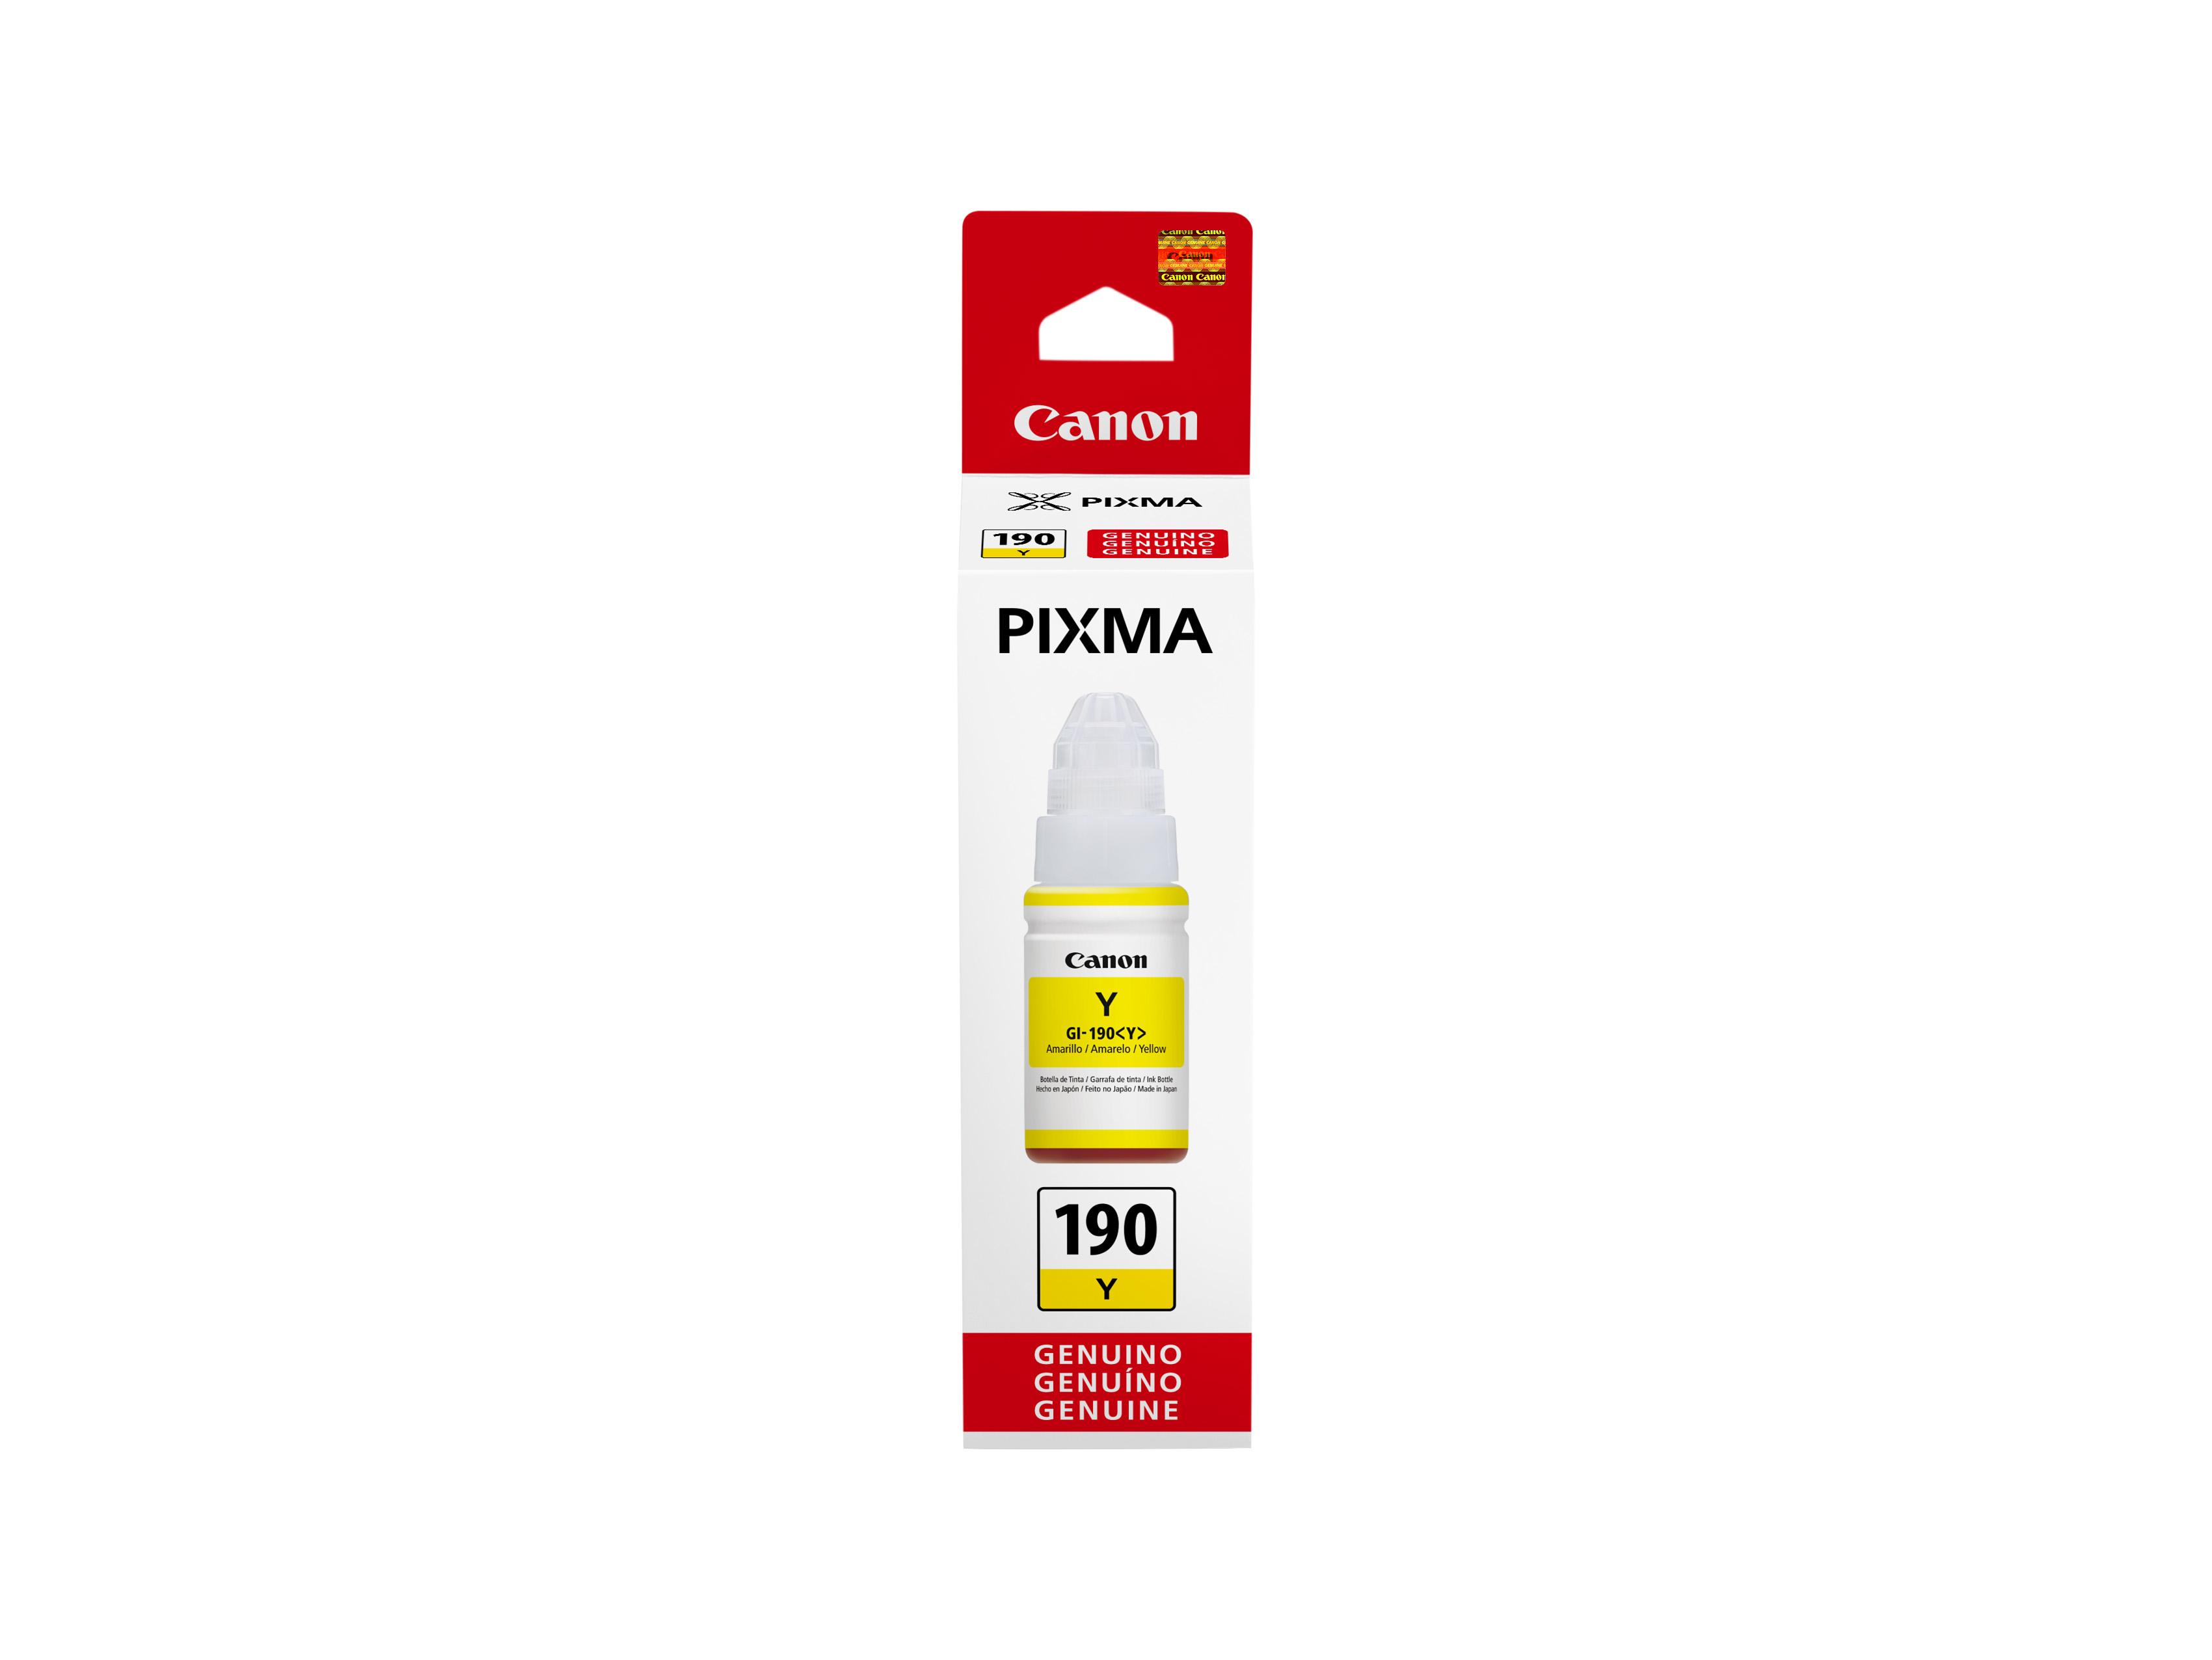 Pixma G3110 Canon Tienda Online Chile Tinta G Series Yellow Gi 190